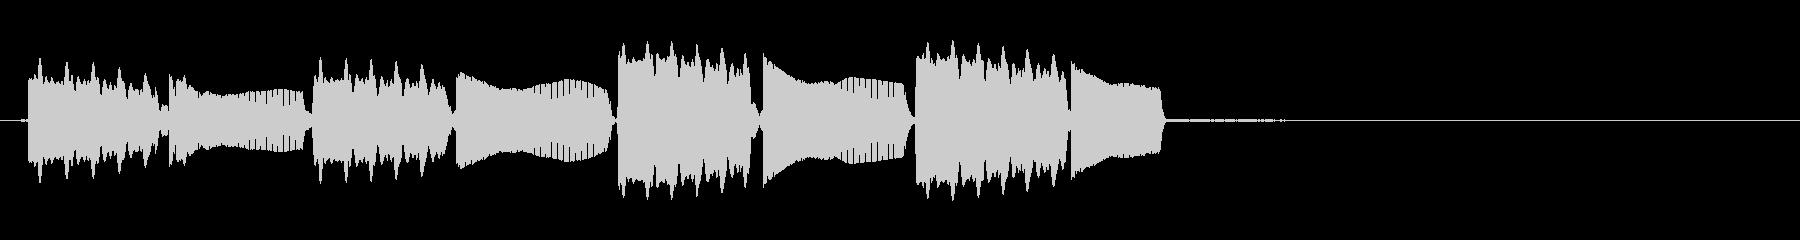 STEEL GUITAR:ツートー...の未再生の波形